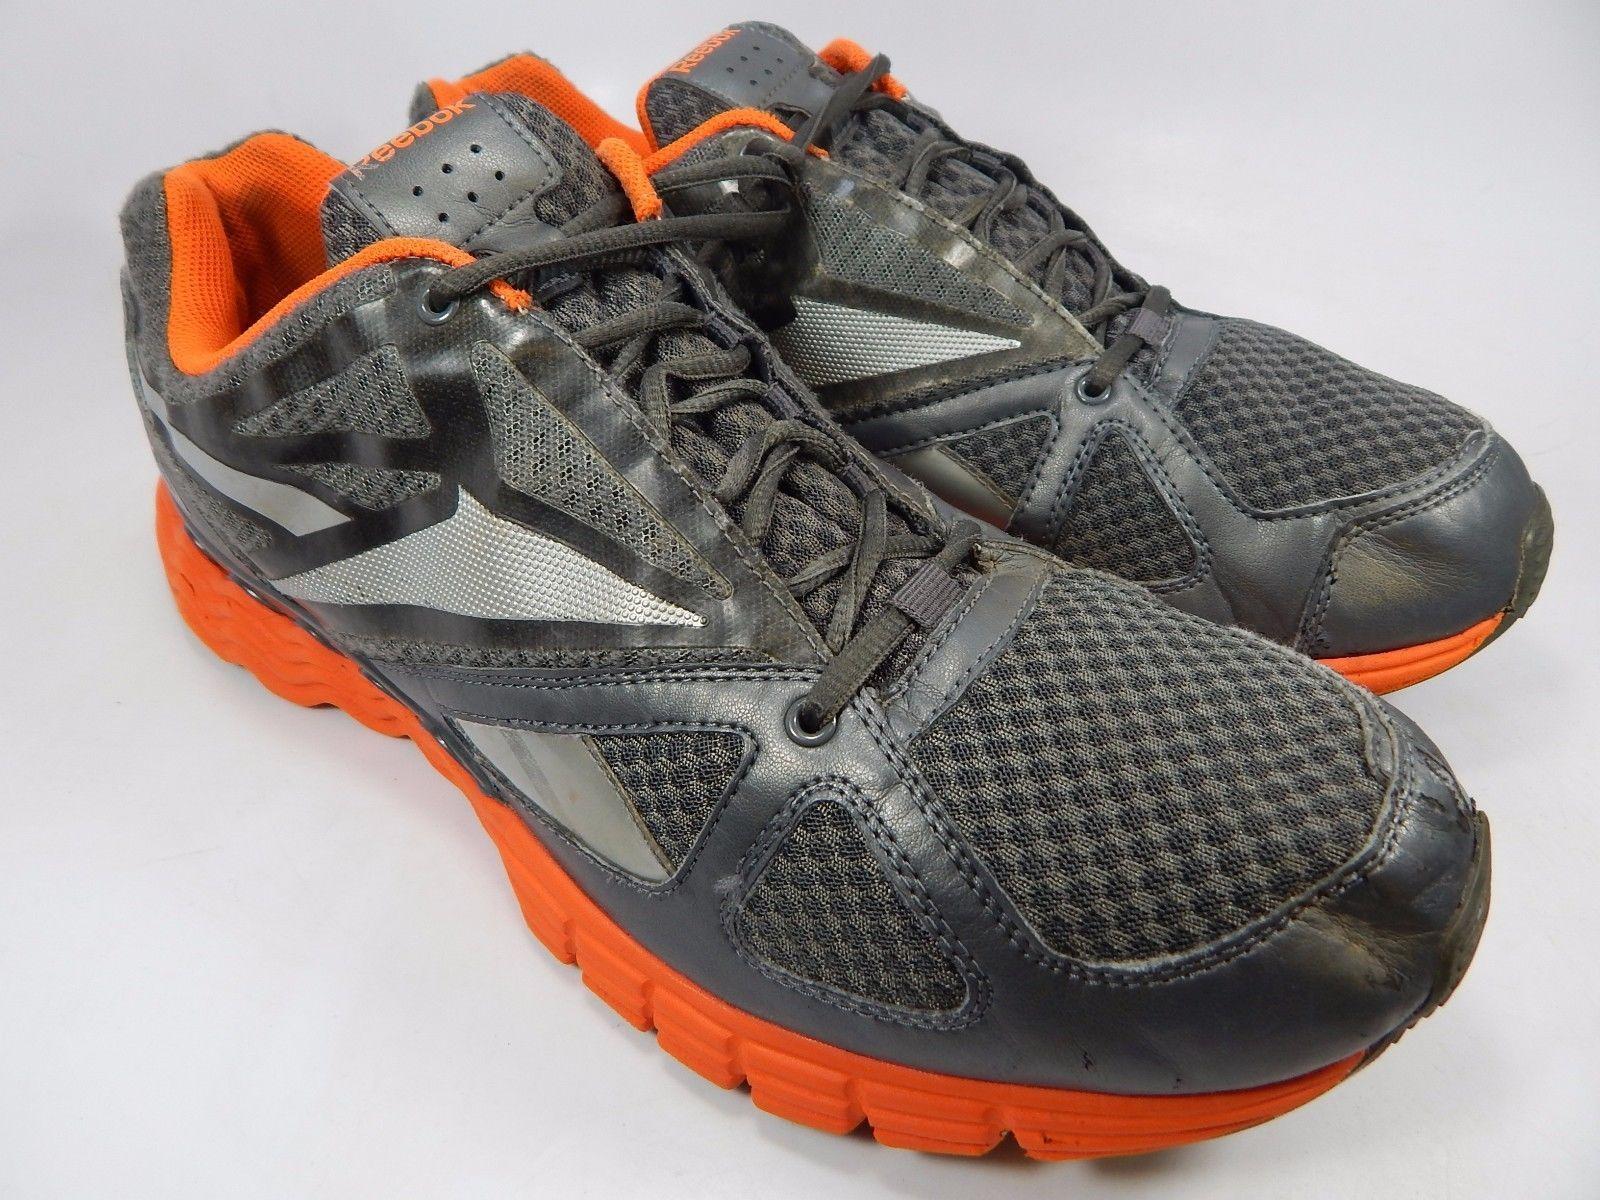 Reebok Realflex Men's Running Shoes Size US 13 M (D) EU 47 Gray Orange J83111